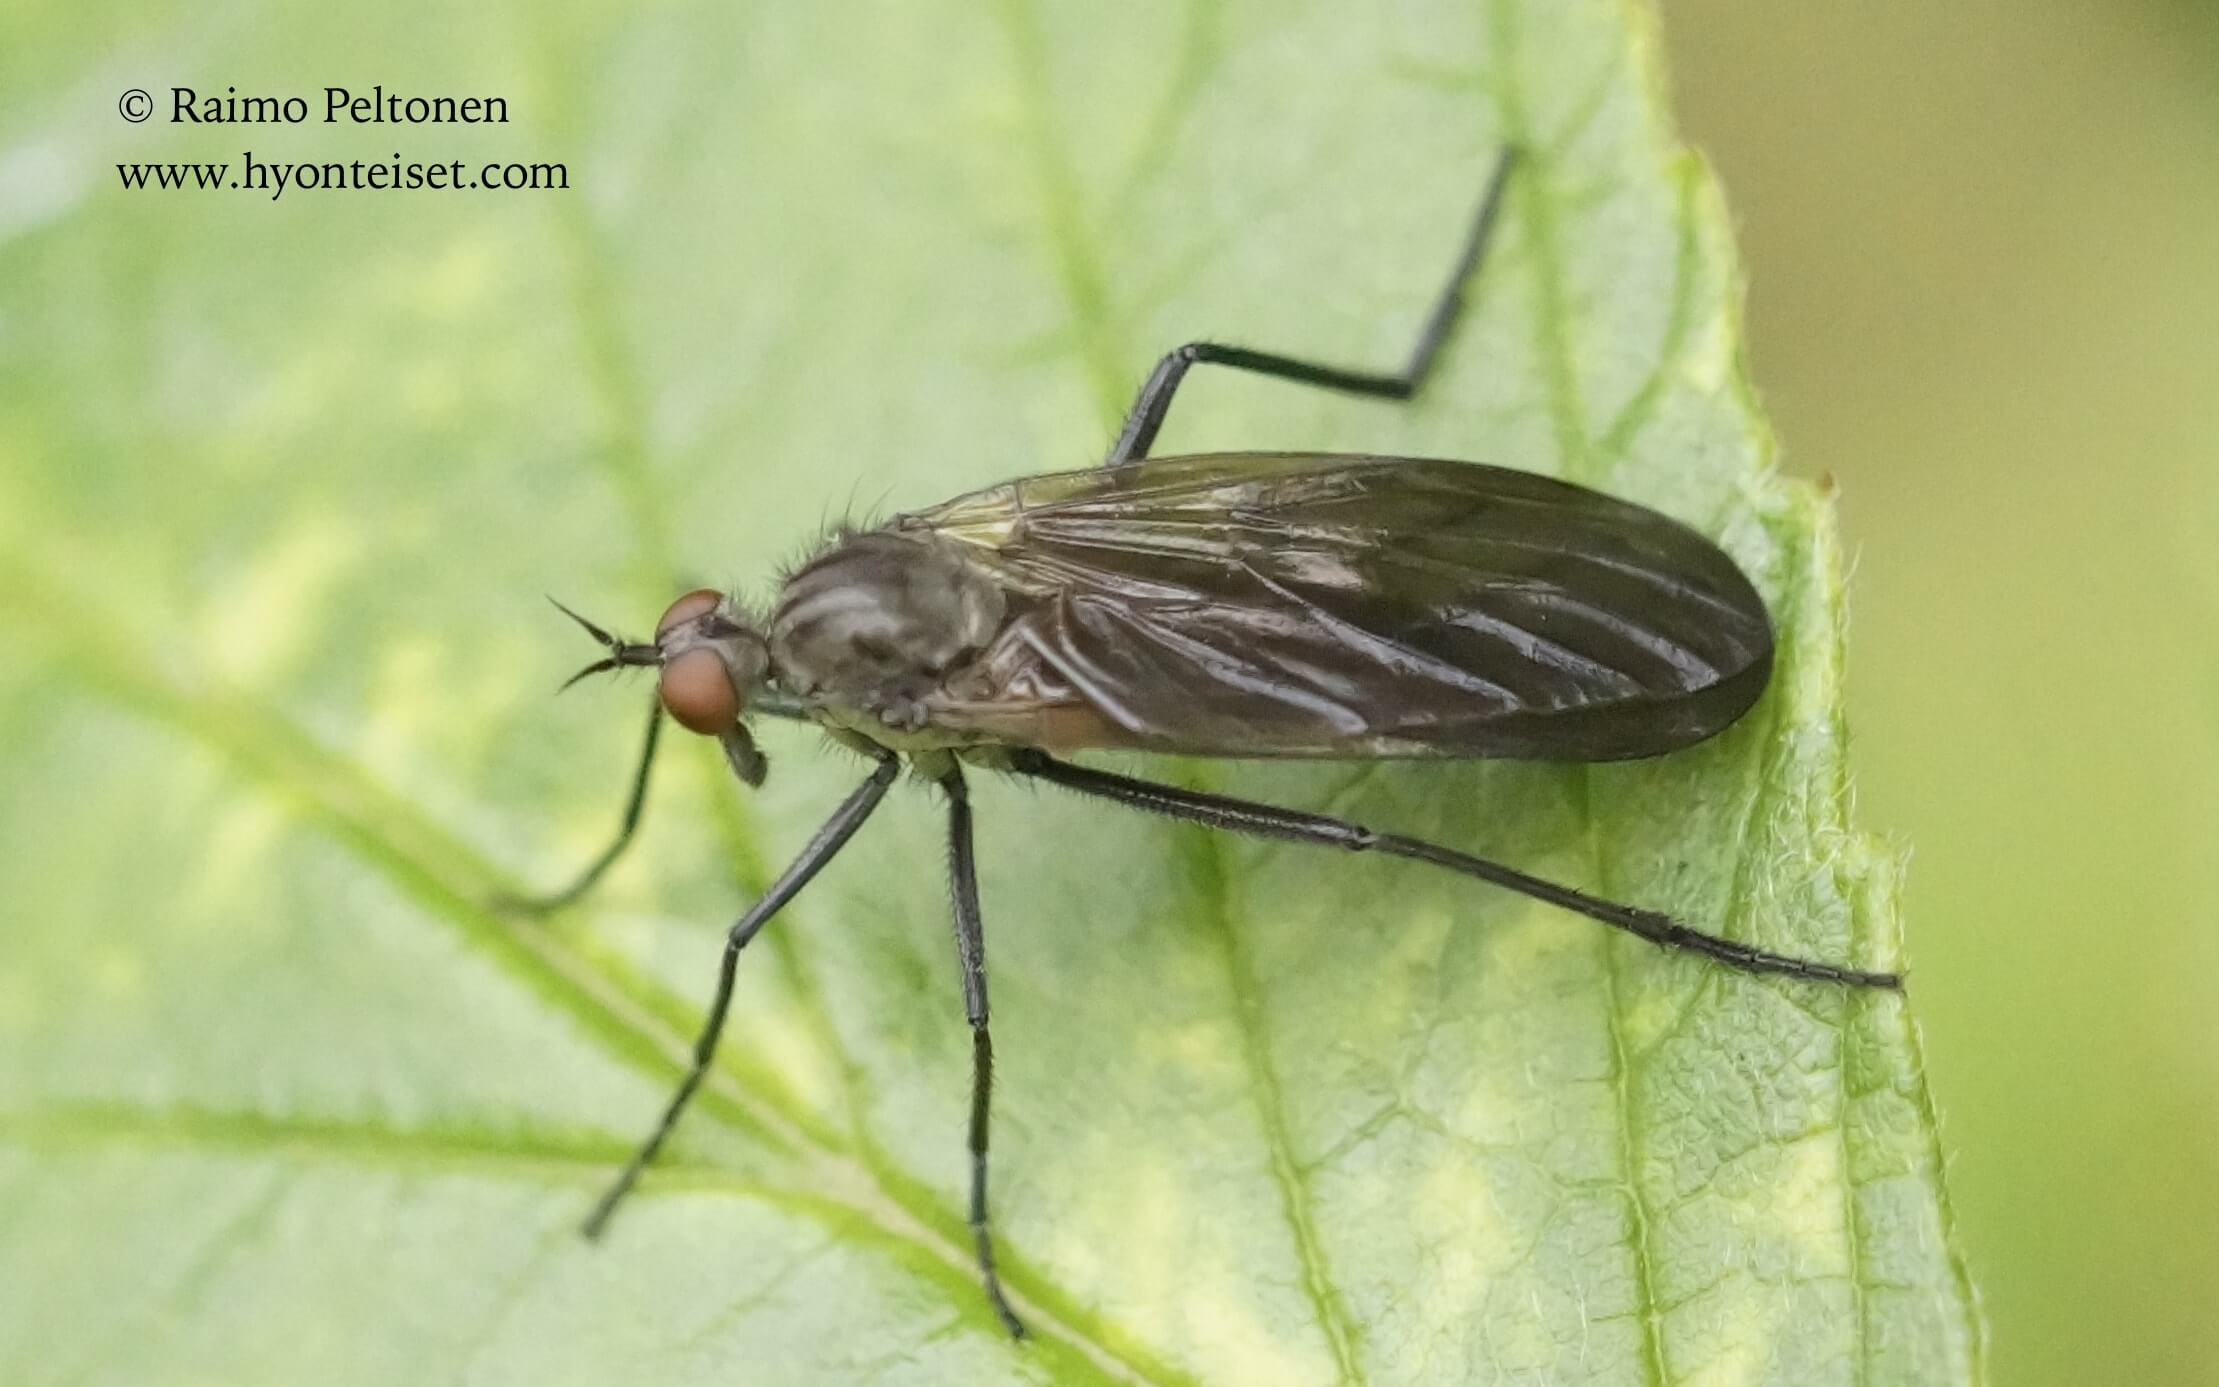 Rhamphomyia spinipes, naaras (det. Paul Beuk), 15.9.2017 Jyväskylä